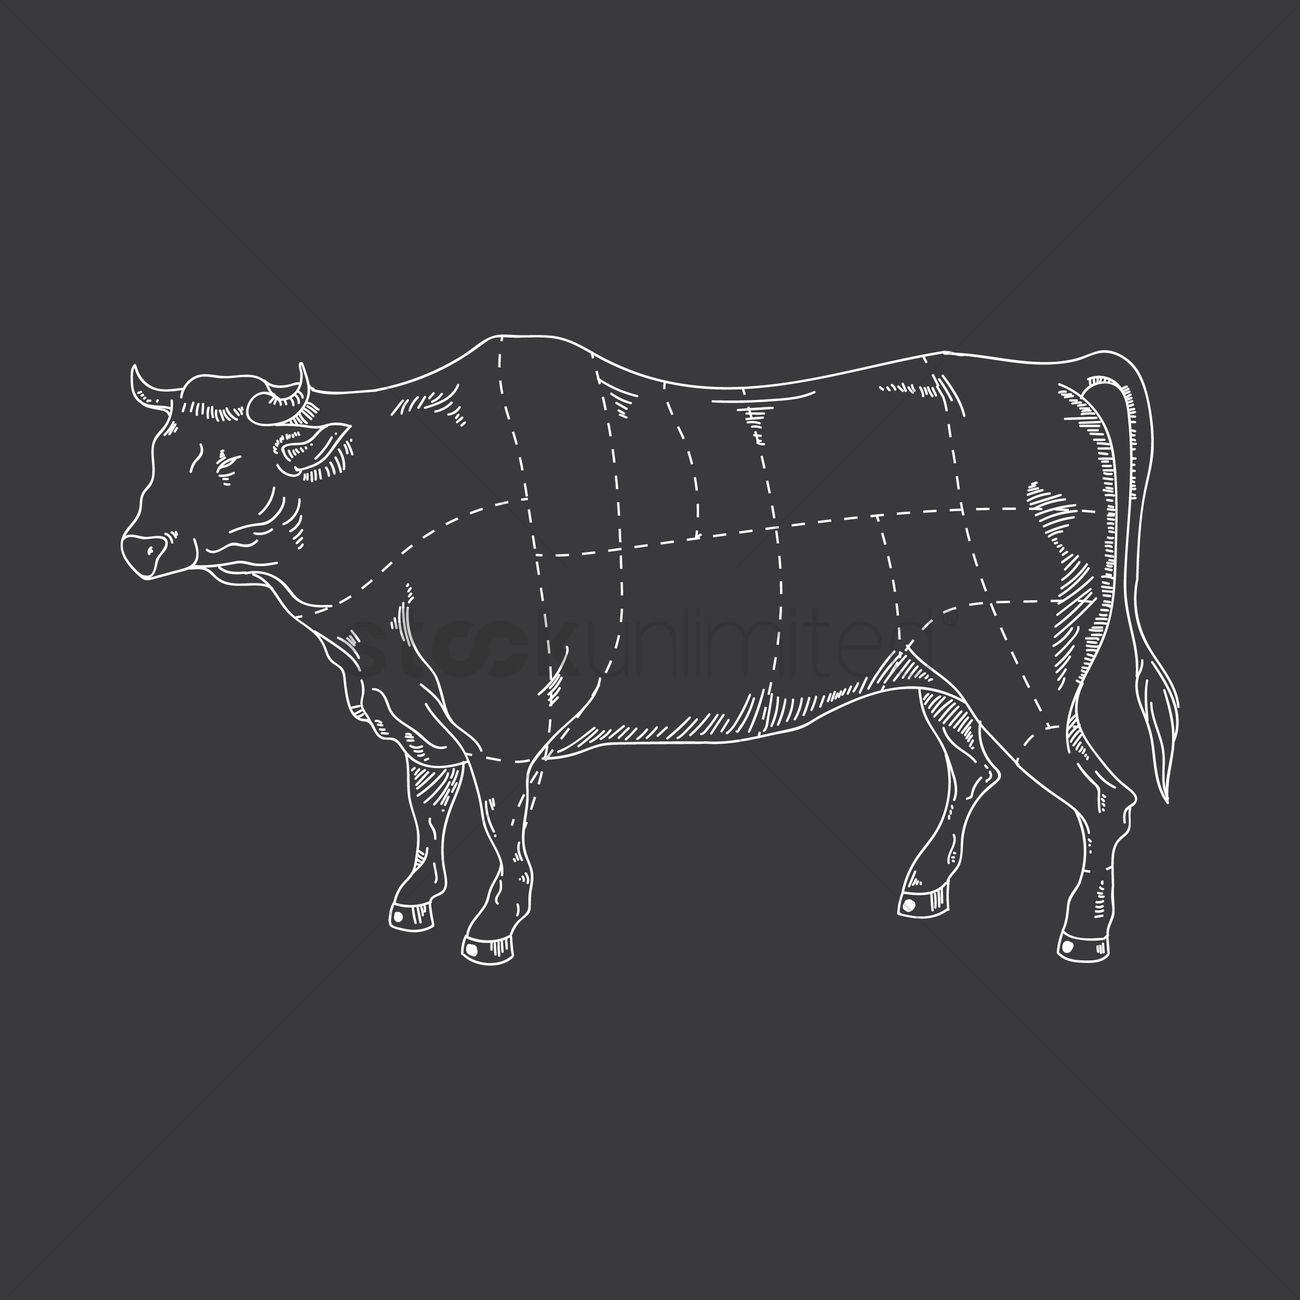 Beef cut diagram vector image 1941809 stockunlimited beef cut diagram vector graphic pooptronica